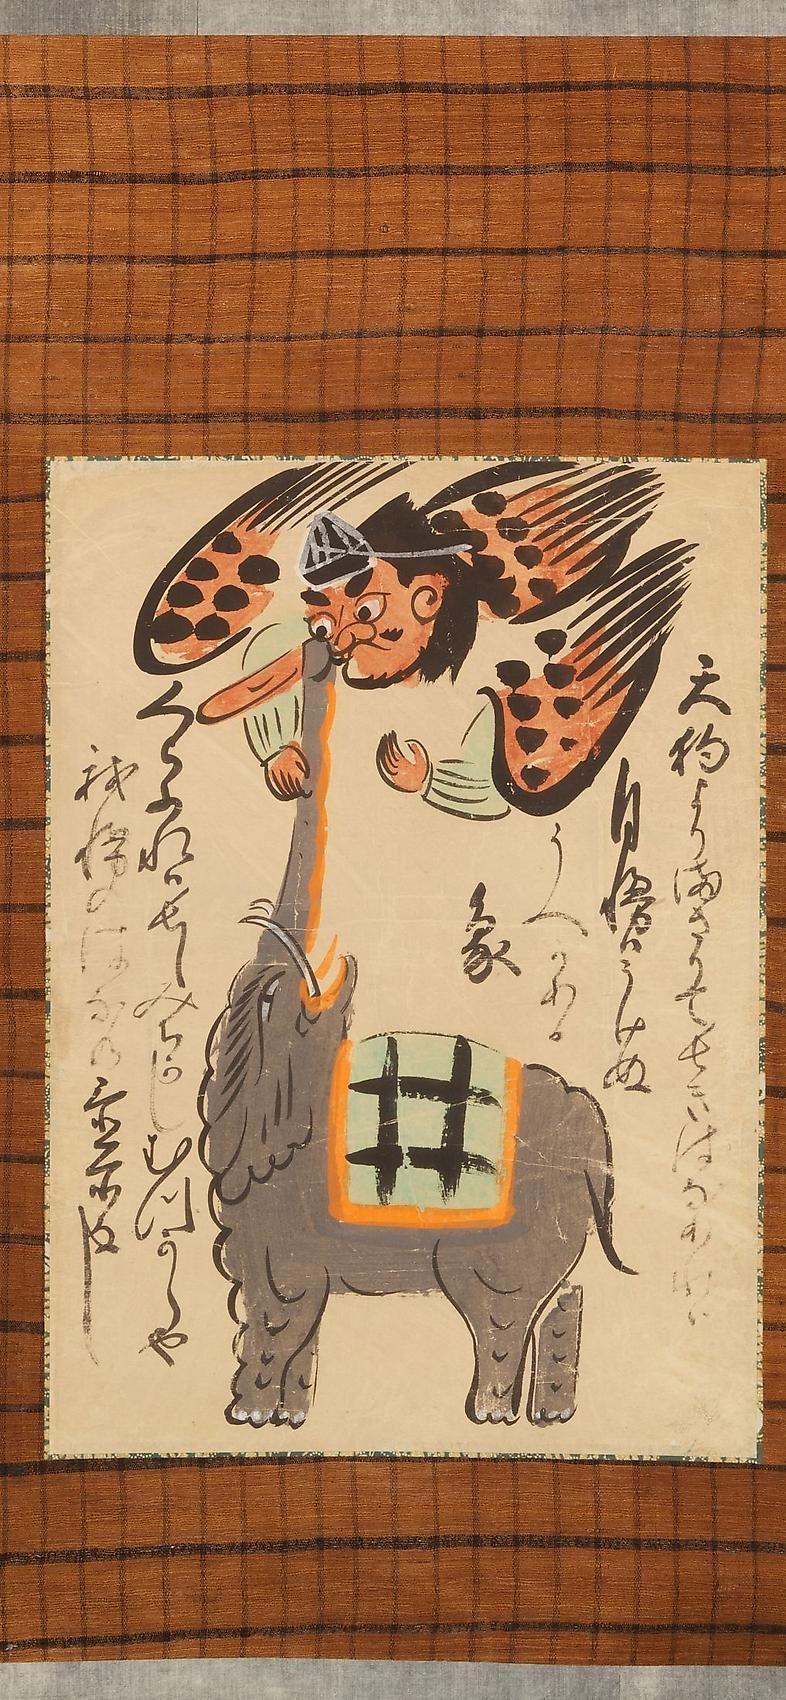 Tengu and elephant comparing noses